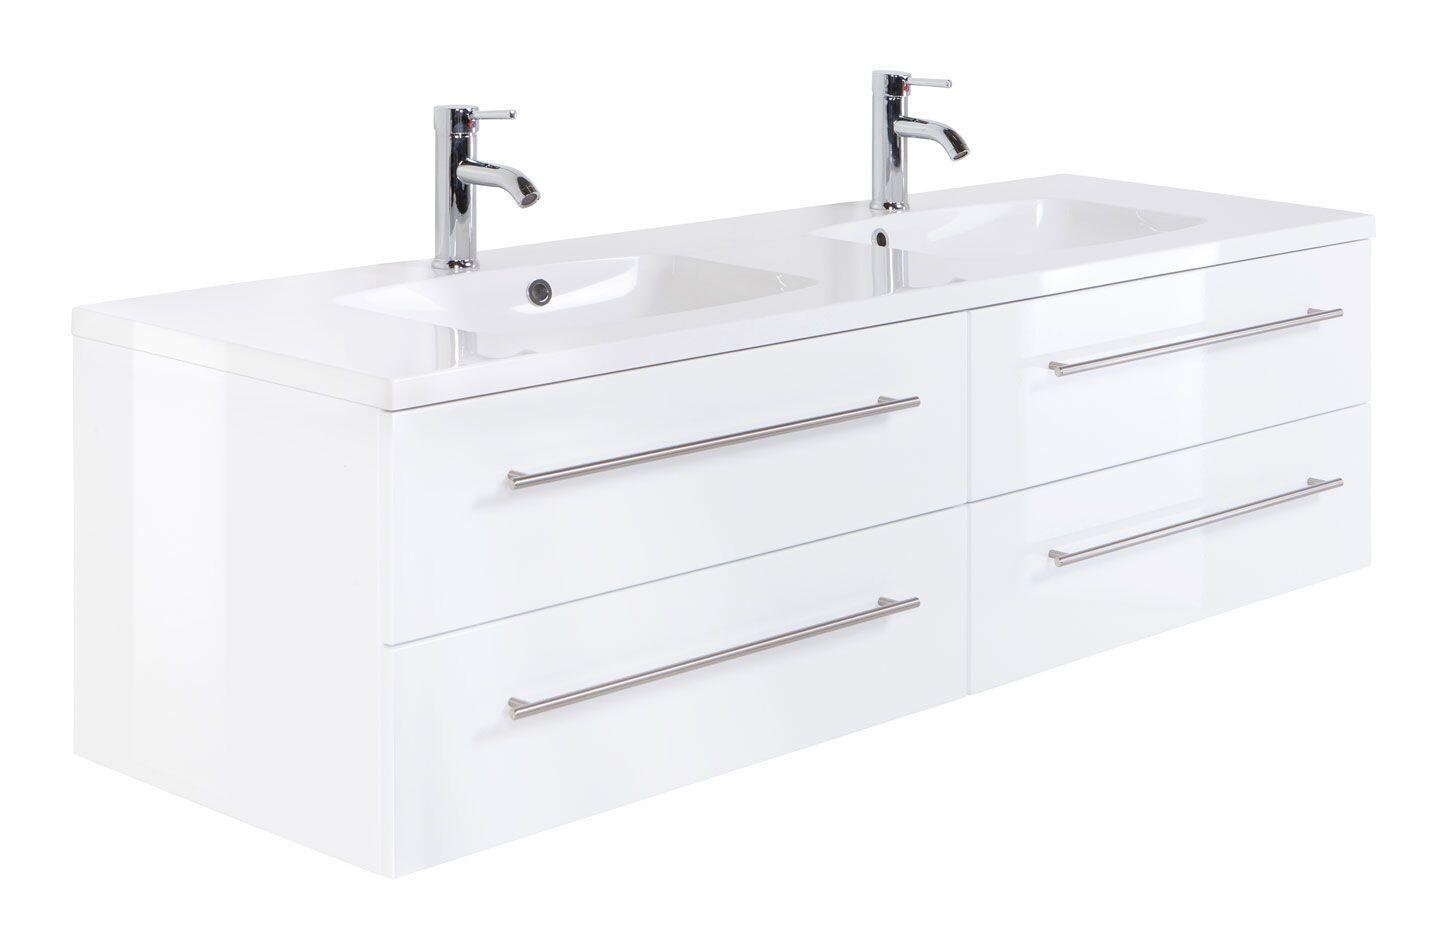 Badkamerkast Zwart Hoogglans : Ikea badkamer kastje ikea badkamerkast hoogglans wit mooie